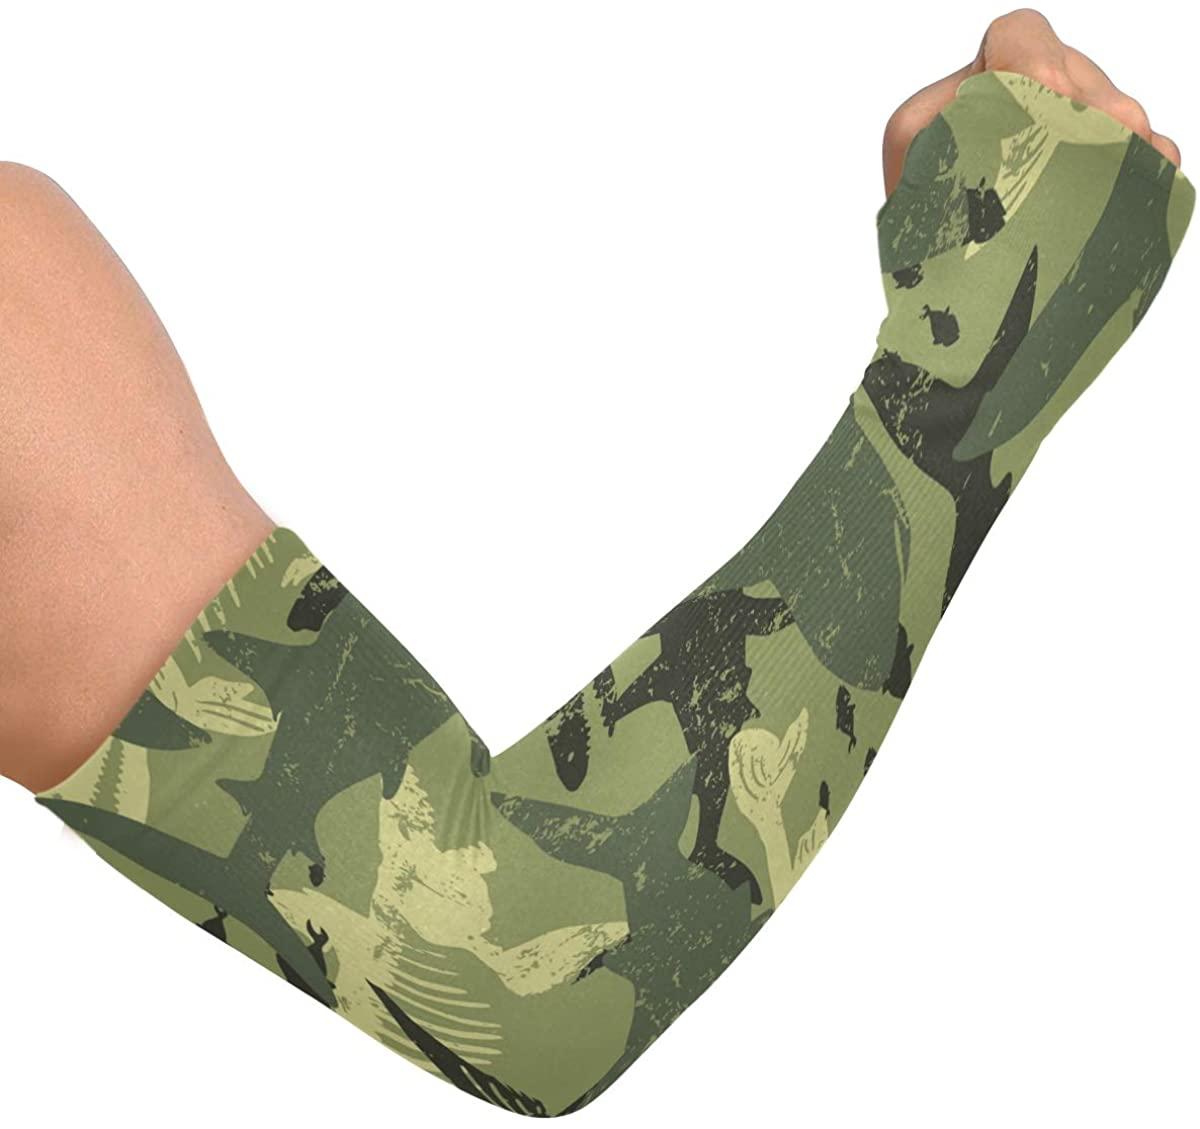 Cooling Arm Sleeves Anti-Slip Camouflage Shark Arm Cover Sleeves for Baseball Basketball Football Running